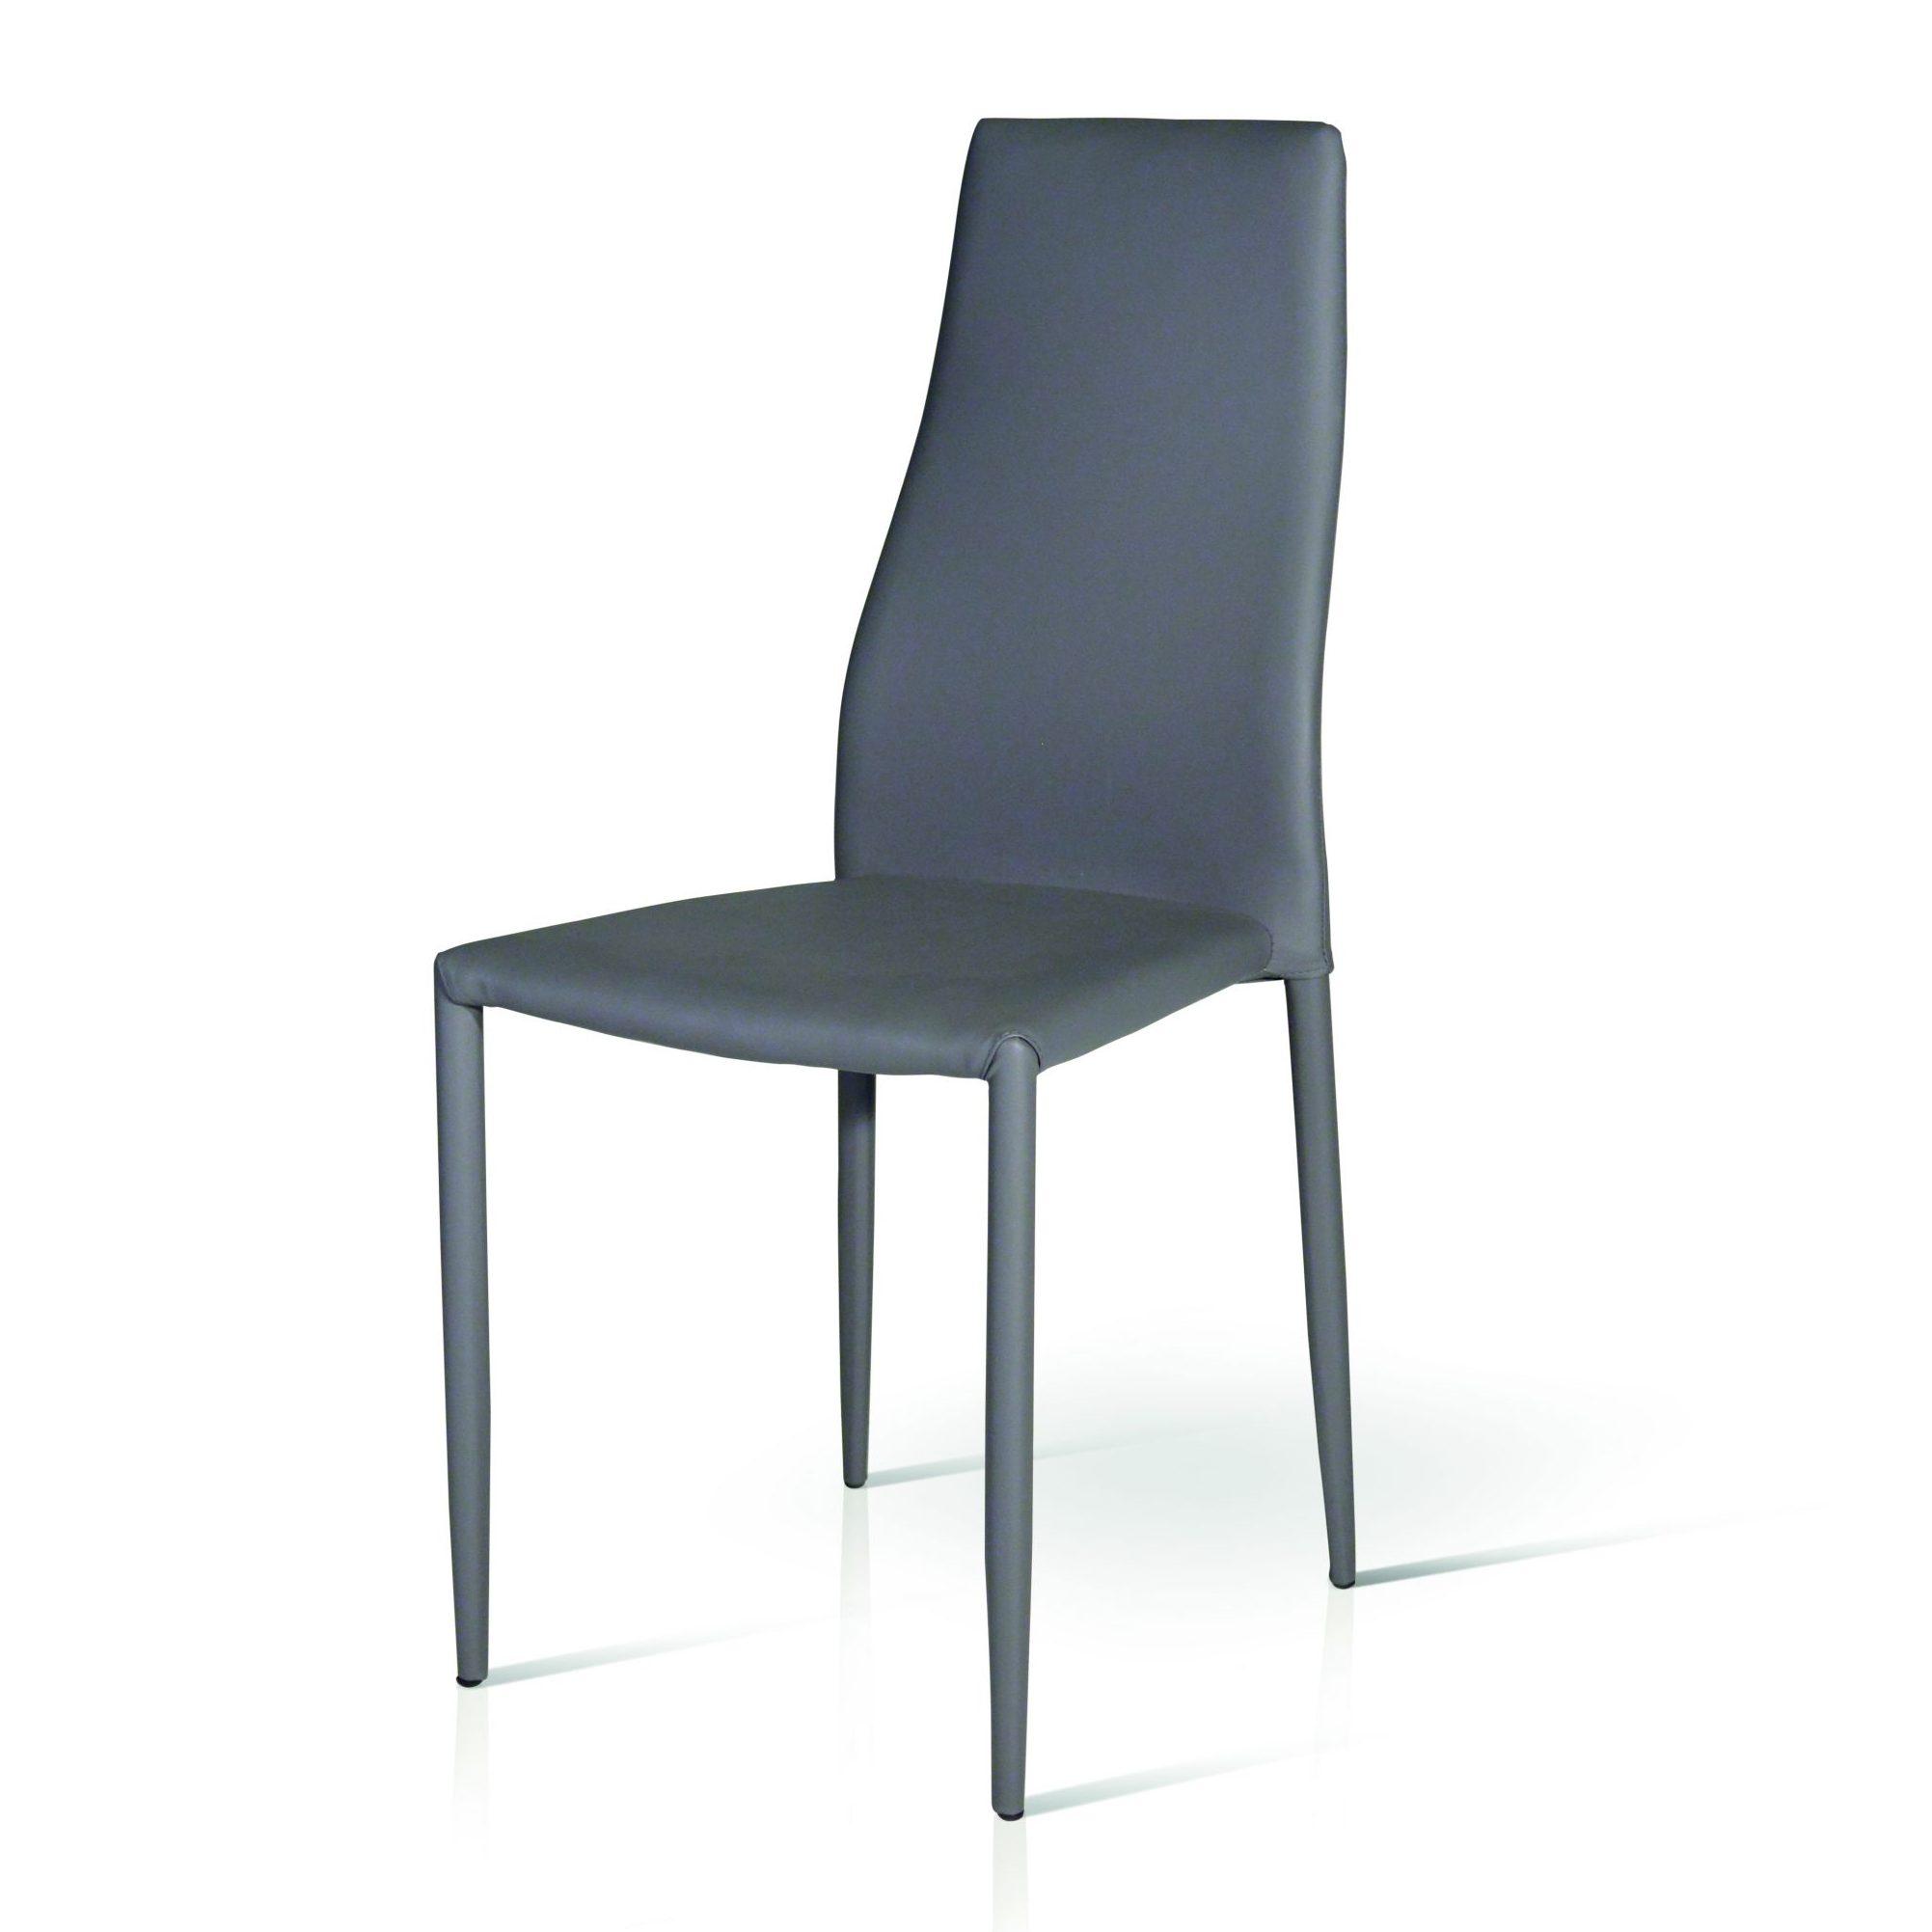 Sedia in stile moderno modello 696